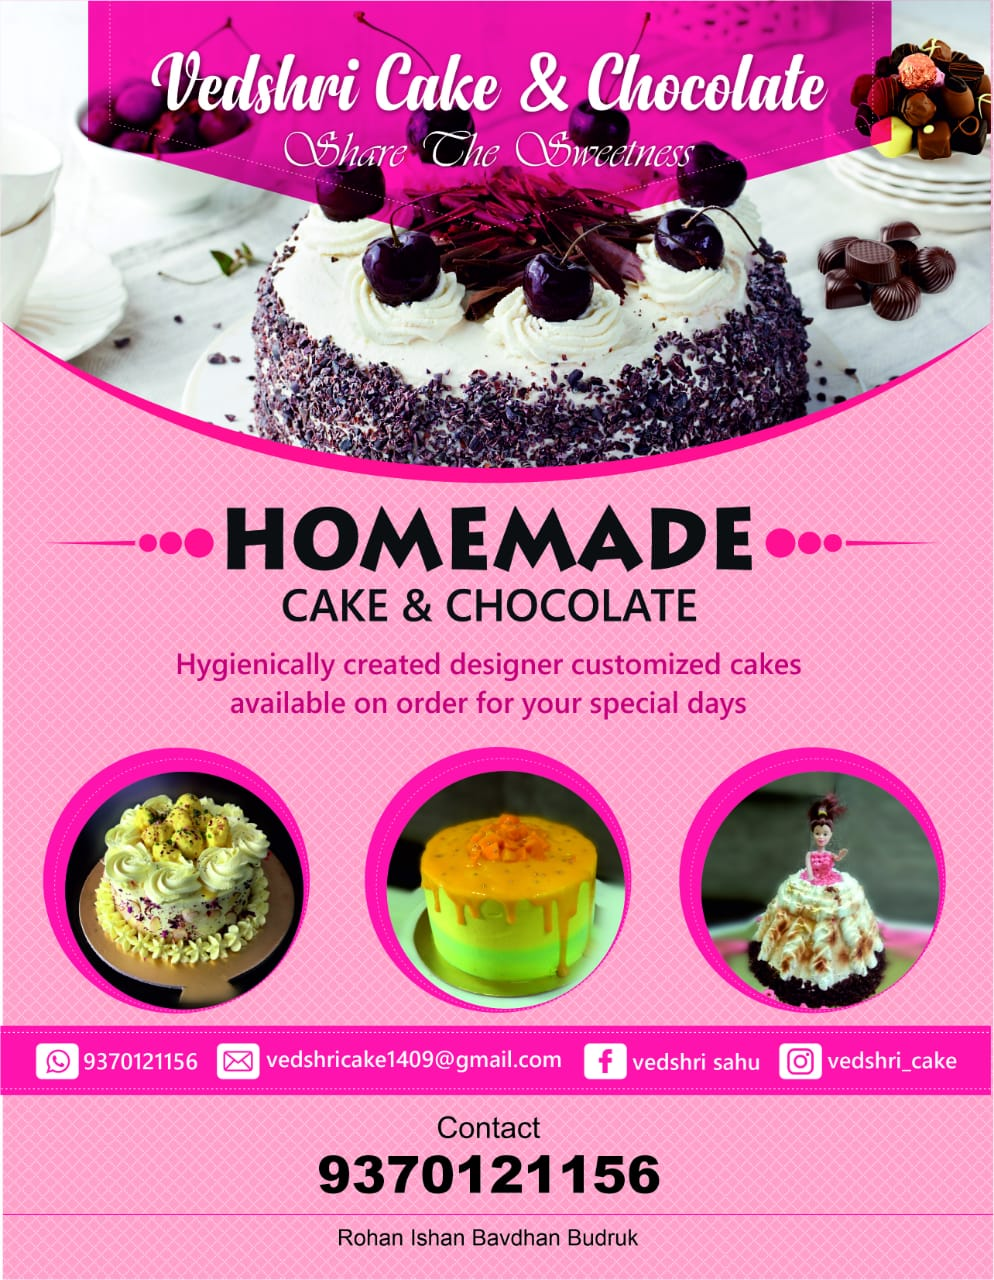 Vedshri cake and chocolate